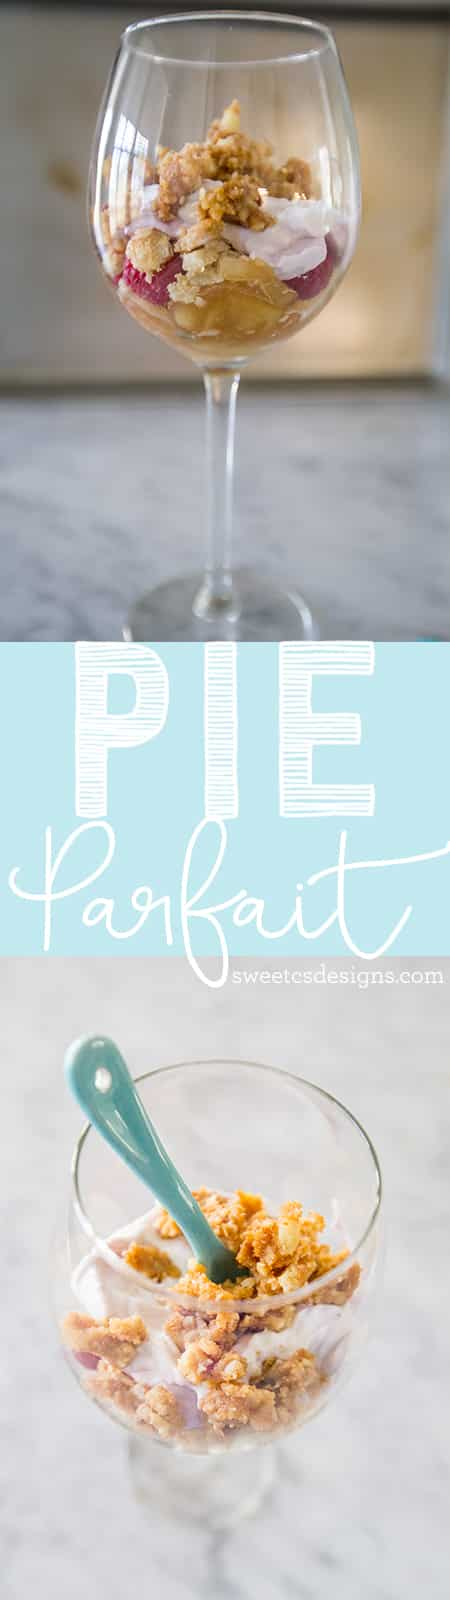 Pie for breakfast- um yes!!!